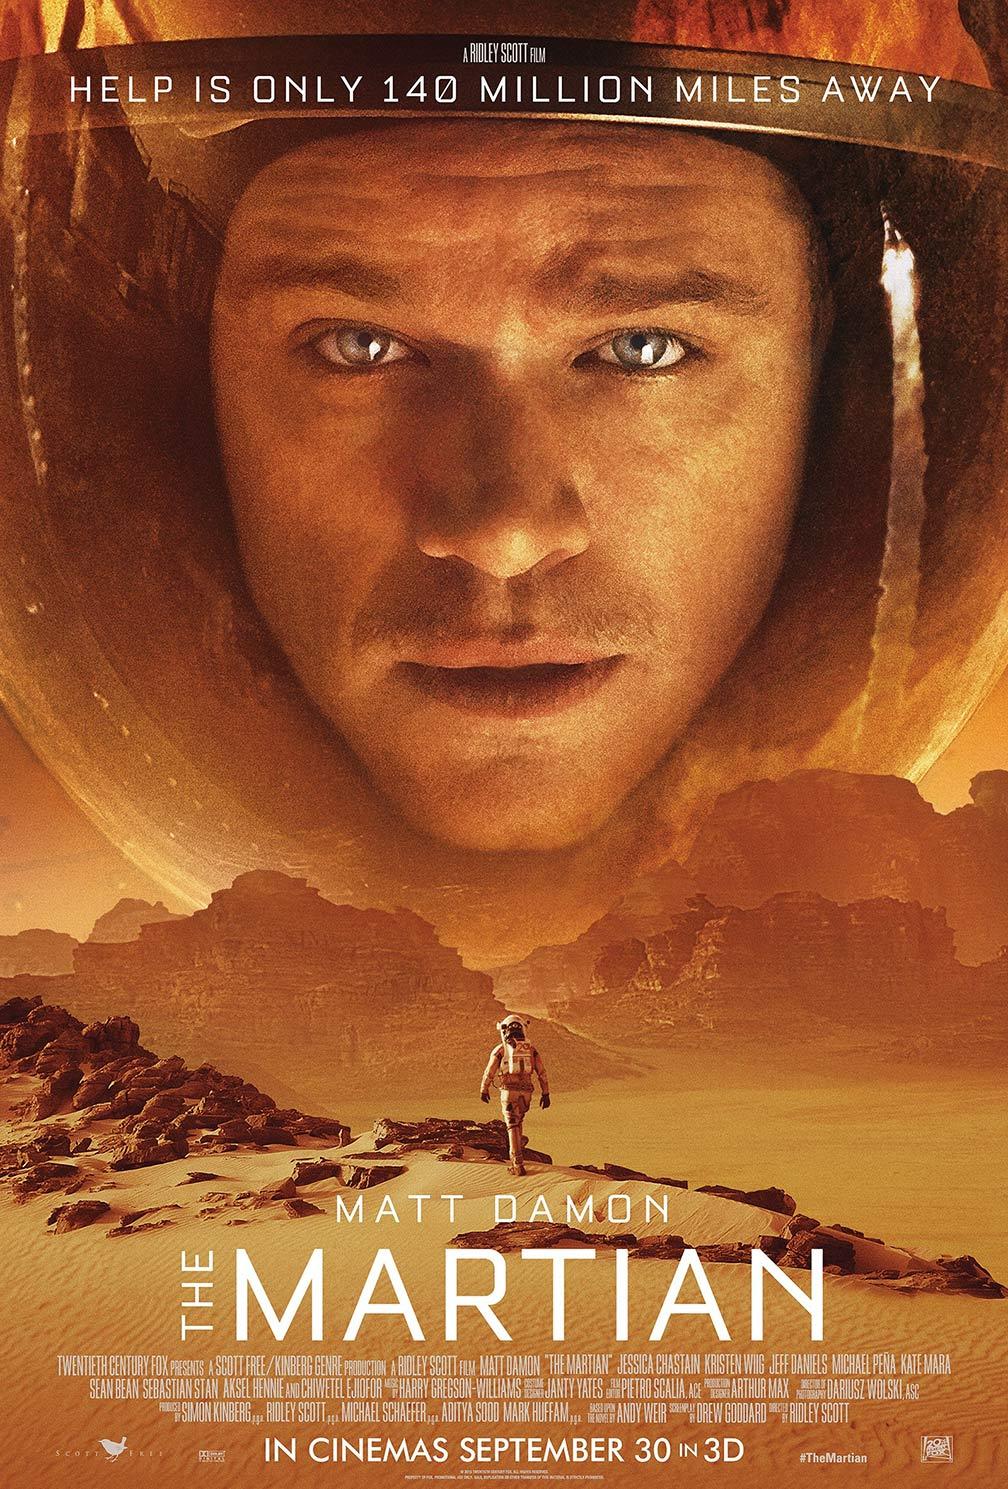 The Martian Poster Matt Damon - Headstuff.org